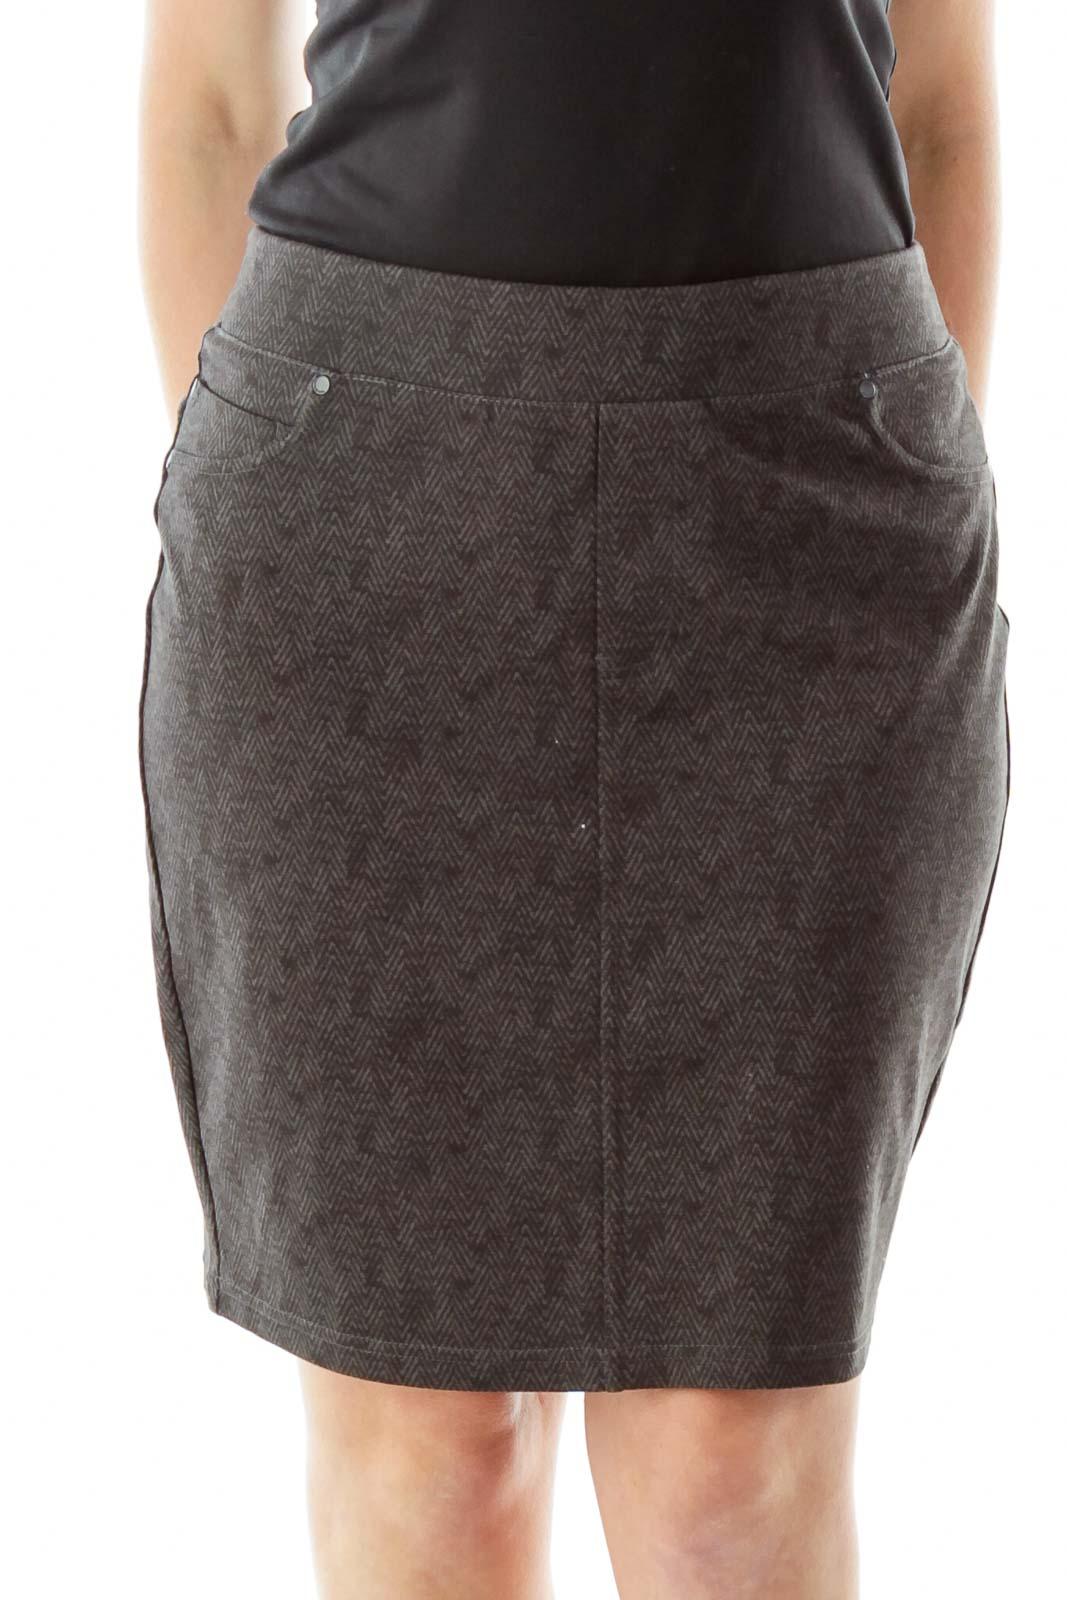 Gray Herringbone Pencil Skirt Front